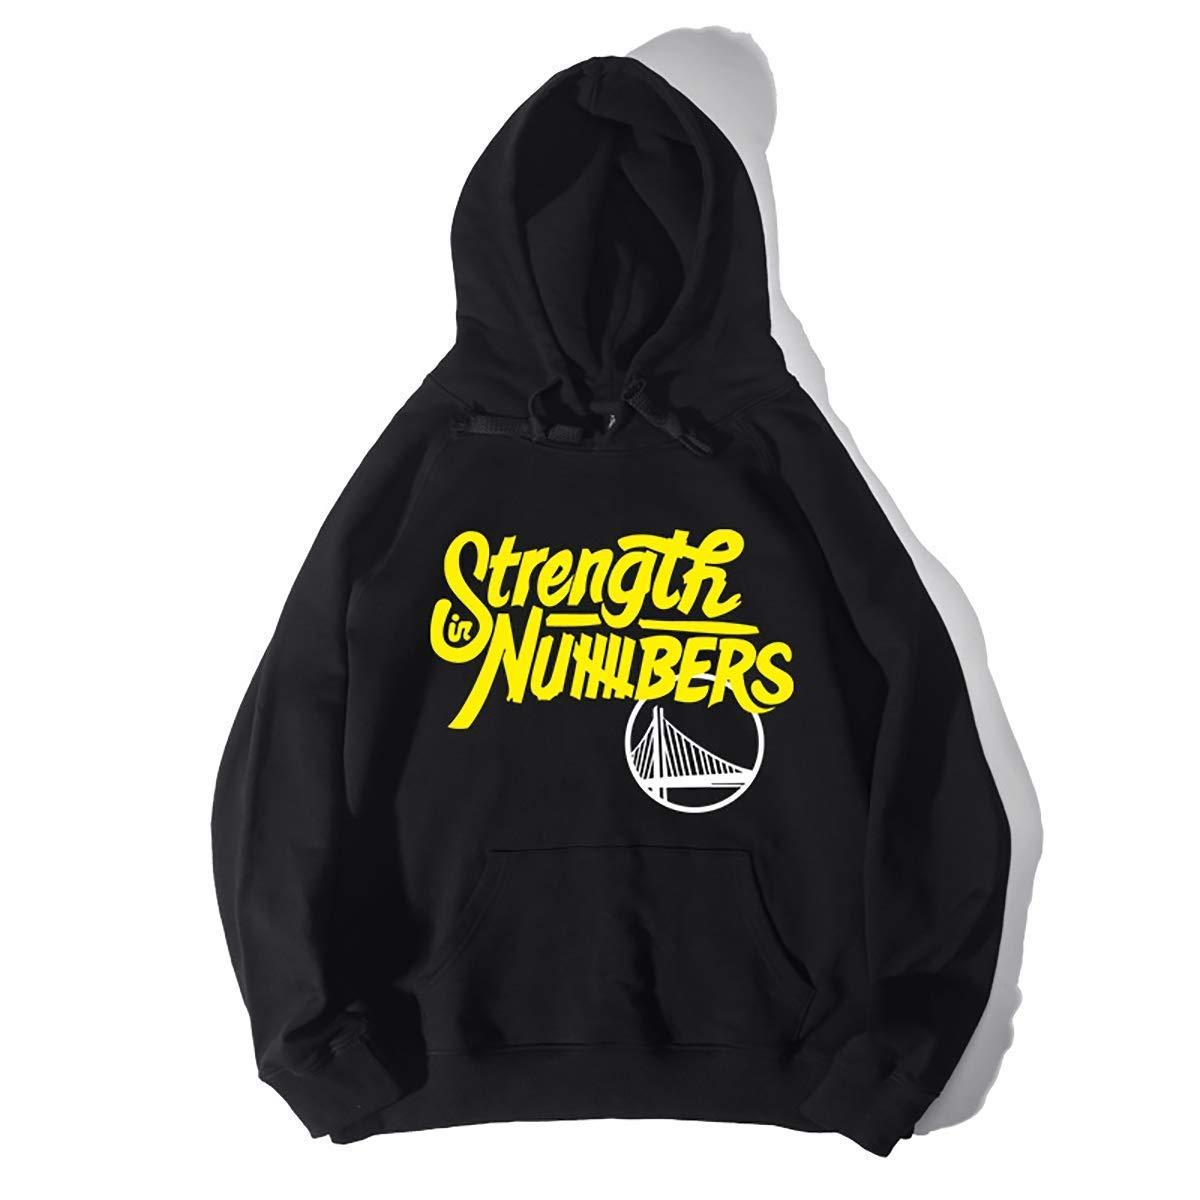 Men es Hooded Sweatshirt, Autumn and Winter Warm Letter Print Pullover Sports Loose Cotton Baseball Uniform, schwarz, L [Energy Class A],schwarz,S